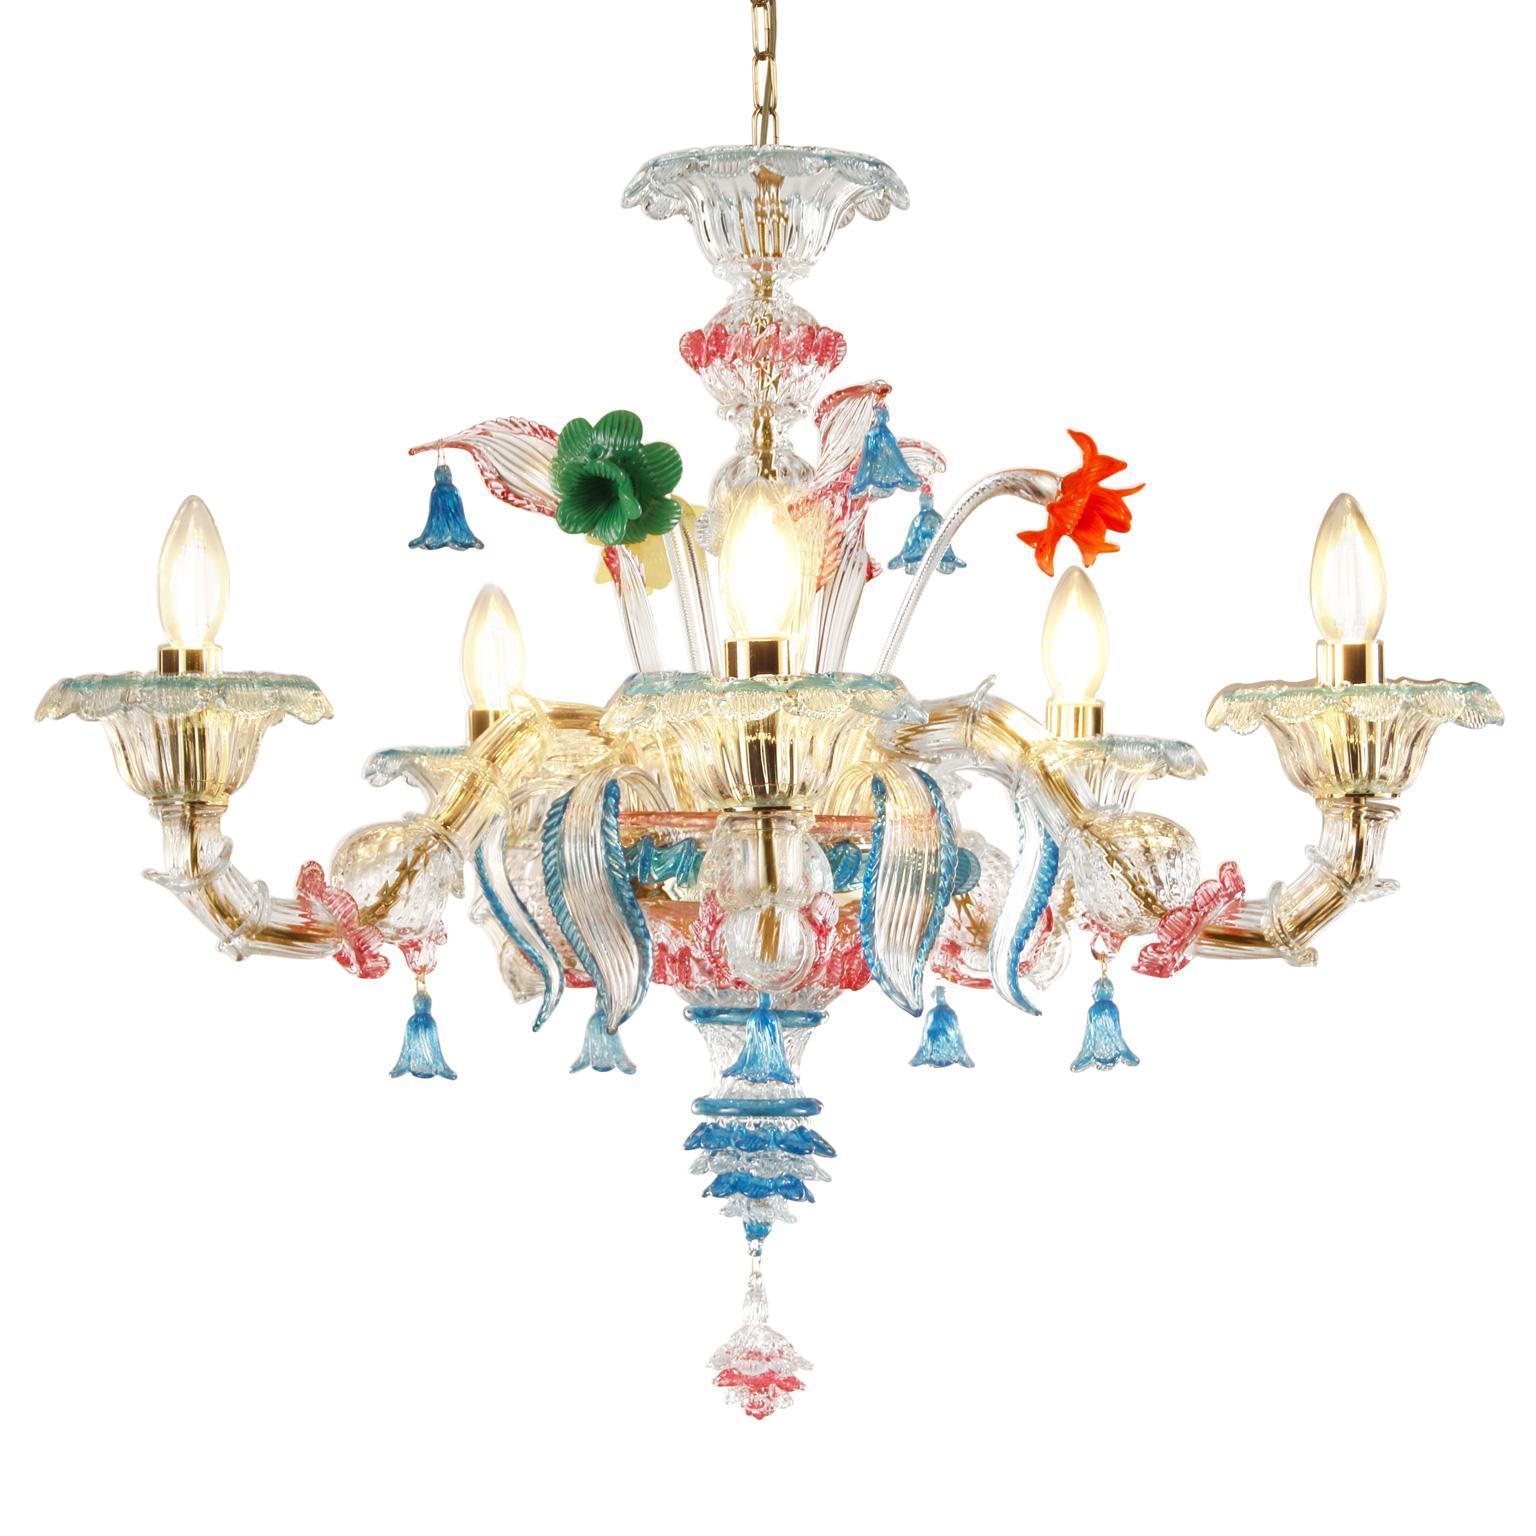 Murano Glass Chandeliers Venice Italy 6 Arms 70 cm Diameter